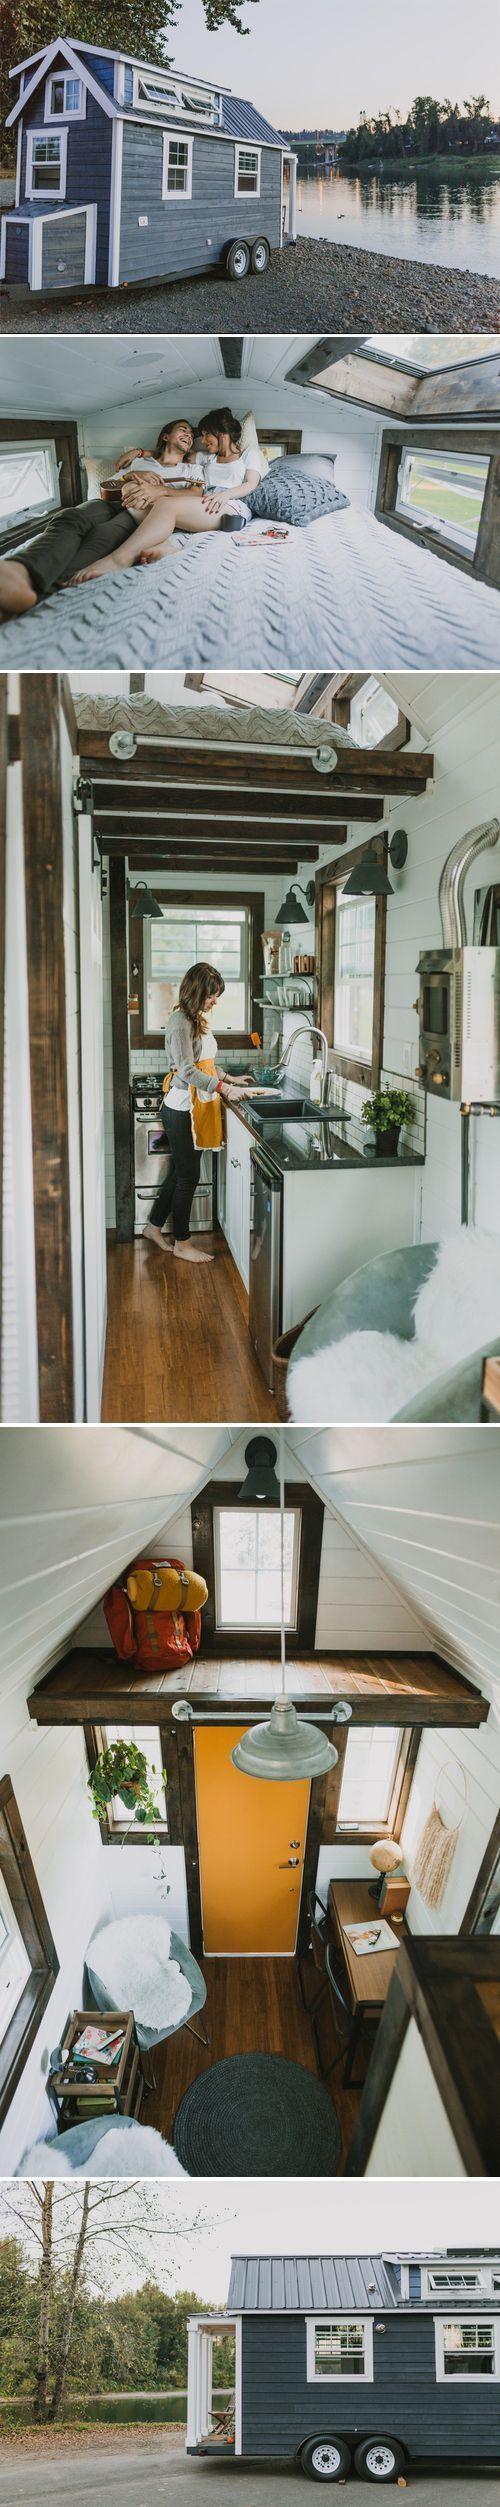 awesome Tiny House by http://www.danaz-homedecor.xyz/tiny-homes/tiny-house/